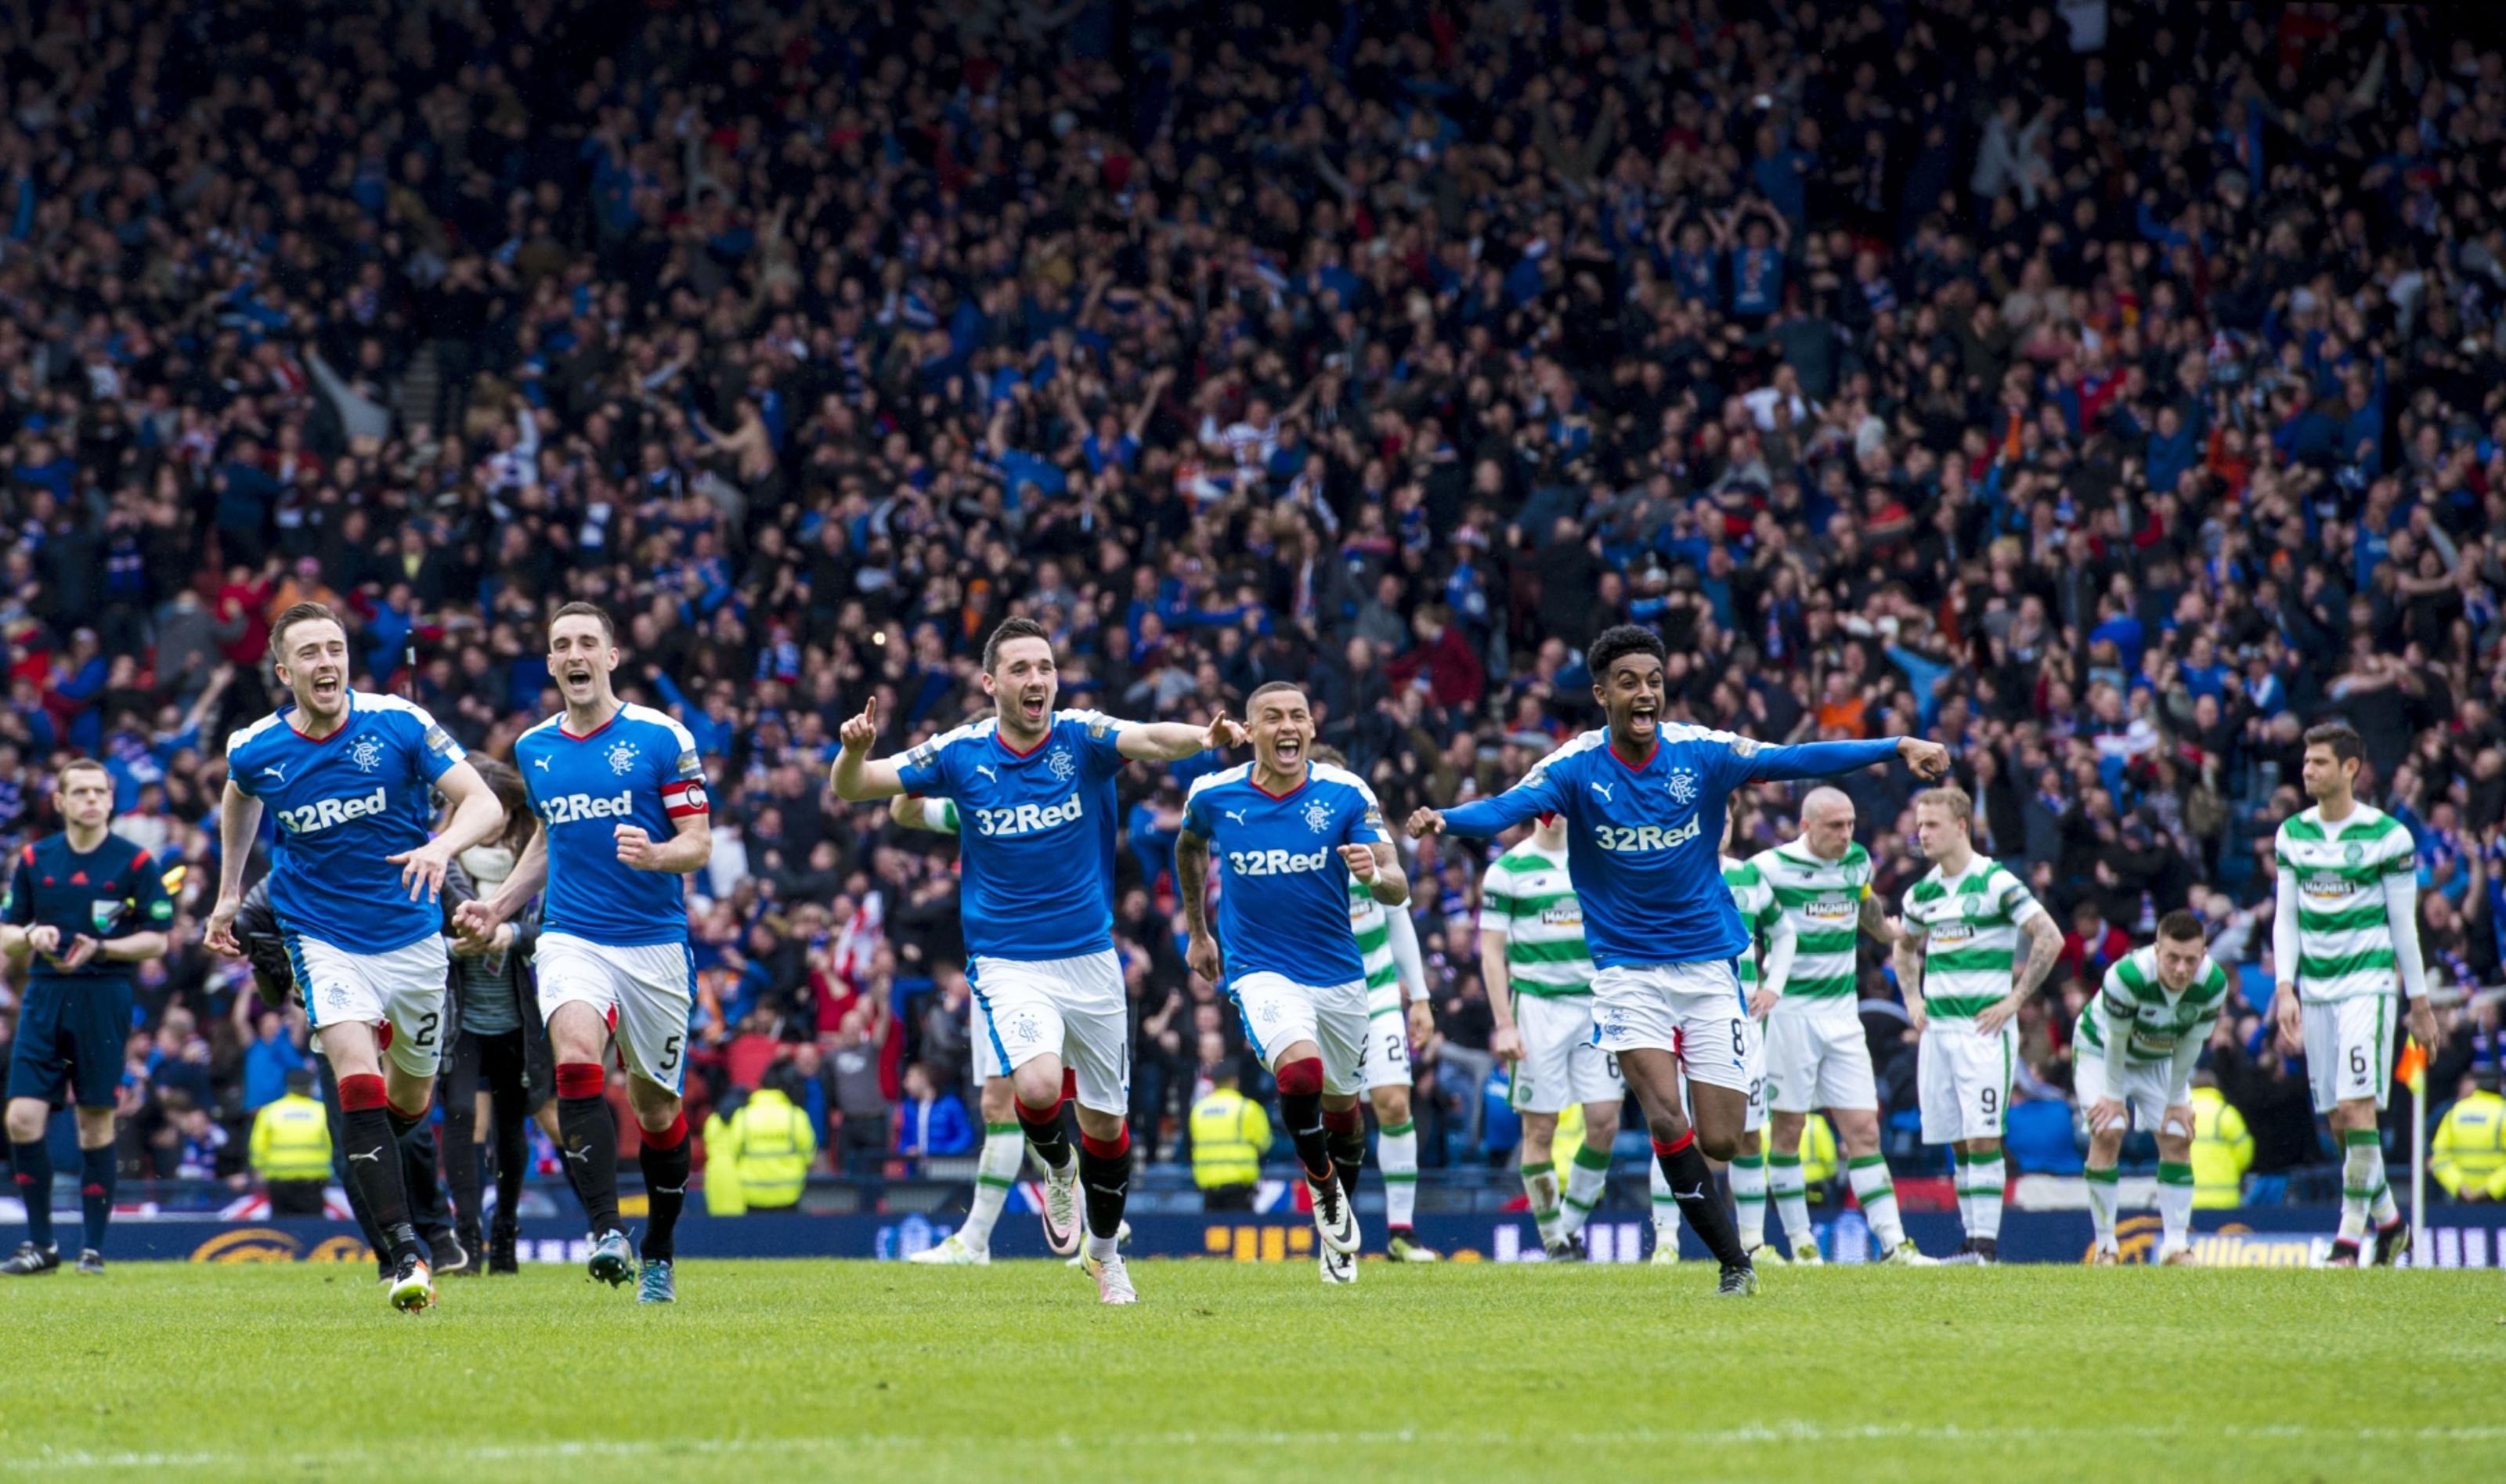 Rangers celebrate the winning moment.